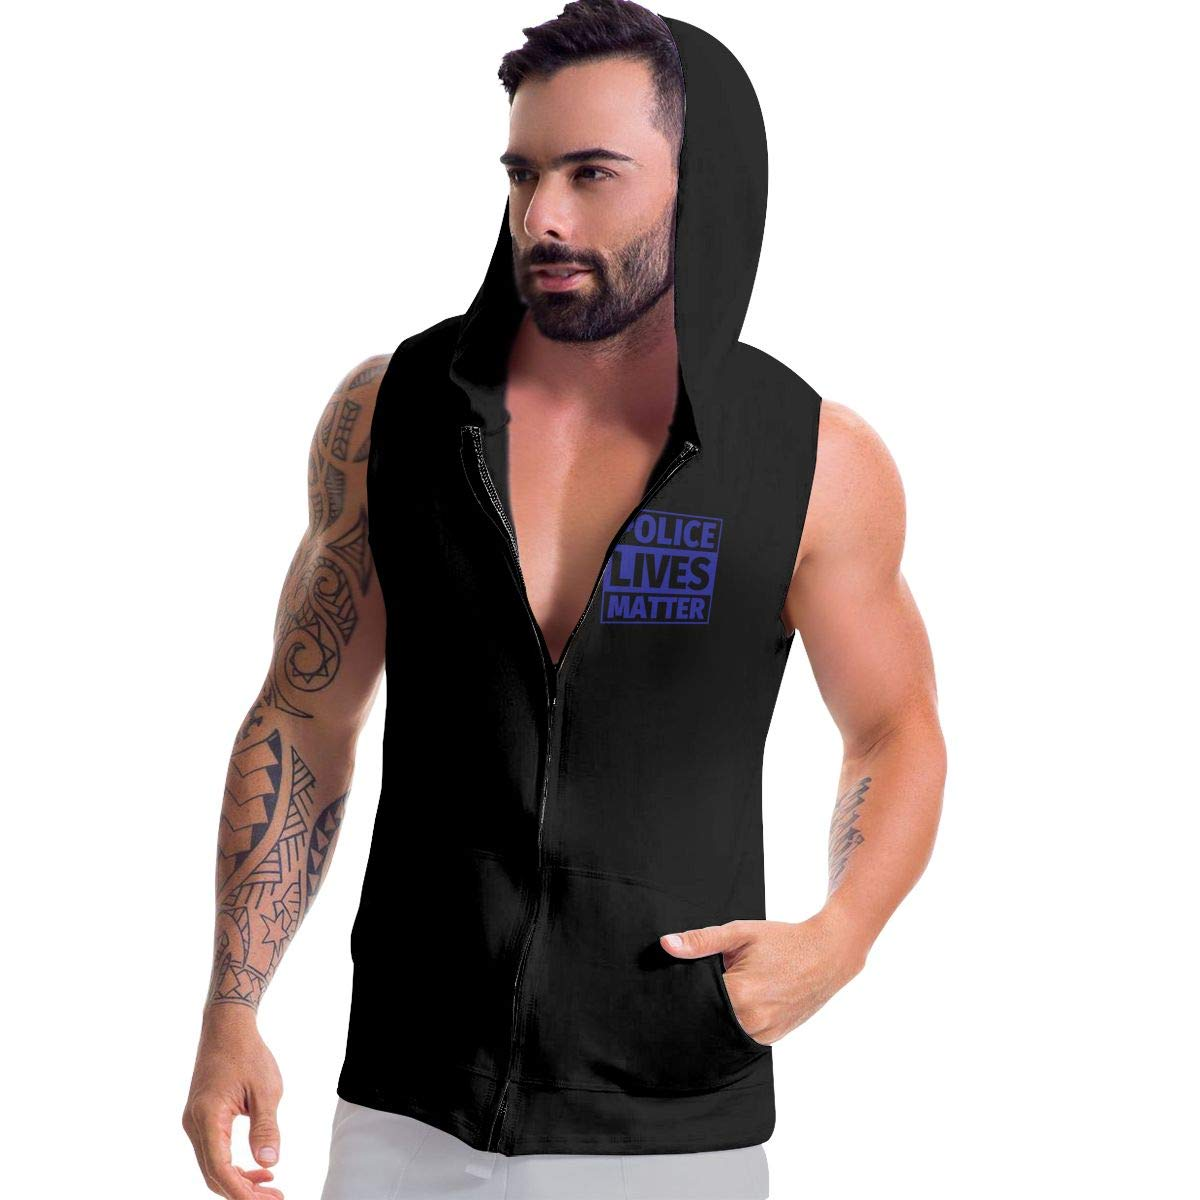 Police Lives Matter Mens Sleeveless Full Zip-Up Fleece Hoodie Active Workout Vest Tank